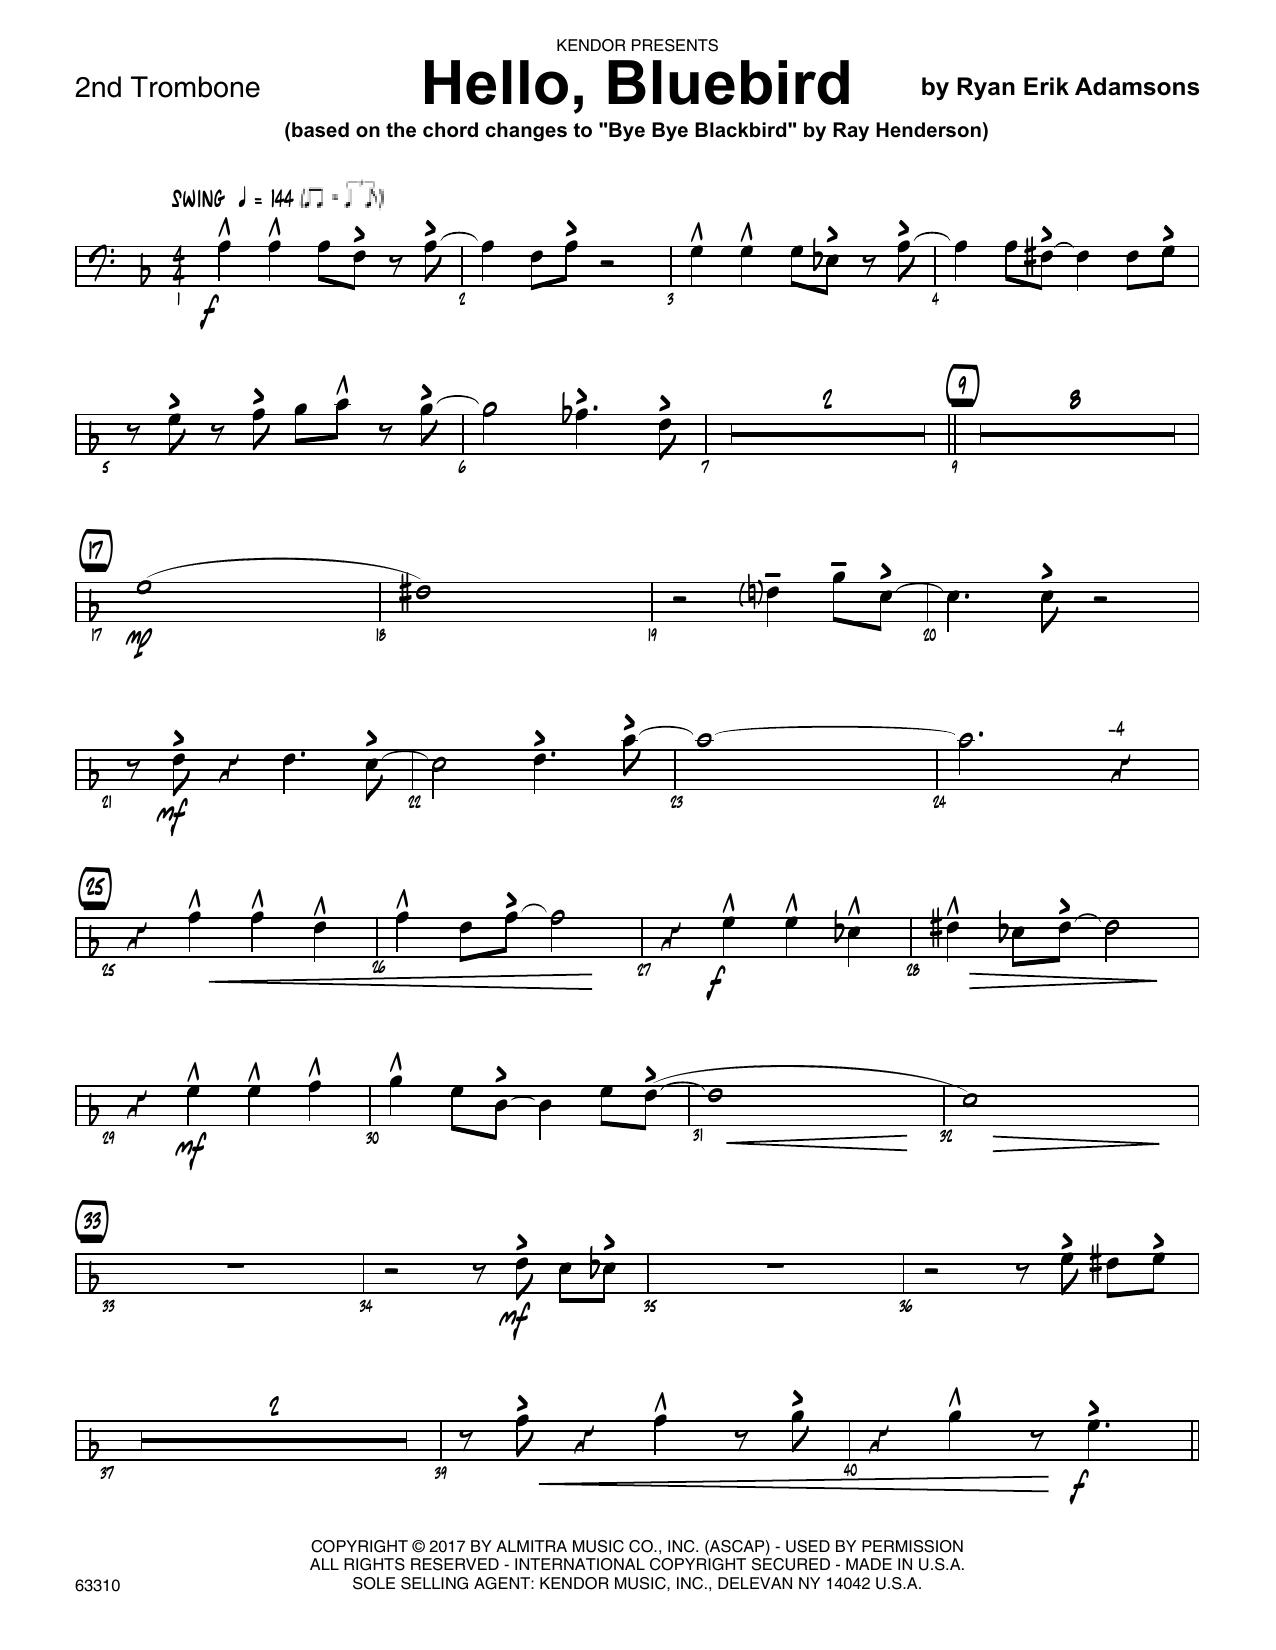 Ryan Erik Adamsons Hello, Bluebird (based on Bye Bye Blackbird) - 2nd Trombone sheet music notes printable PDF score